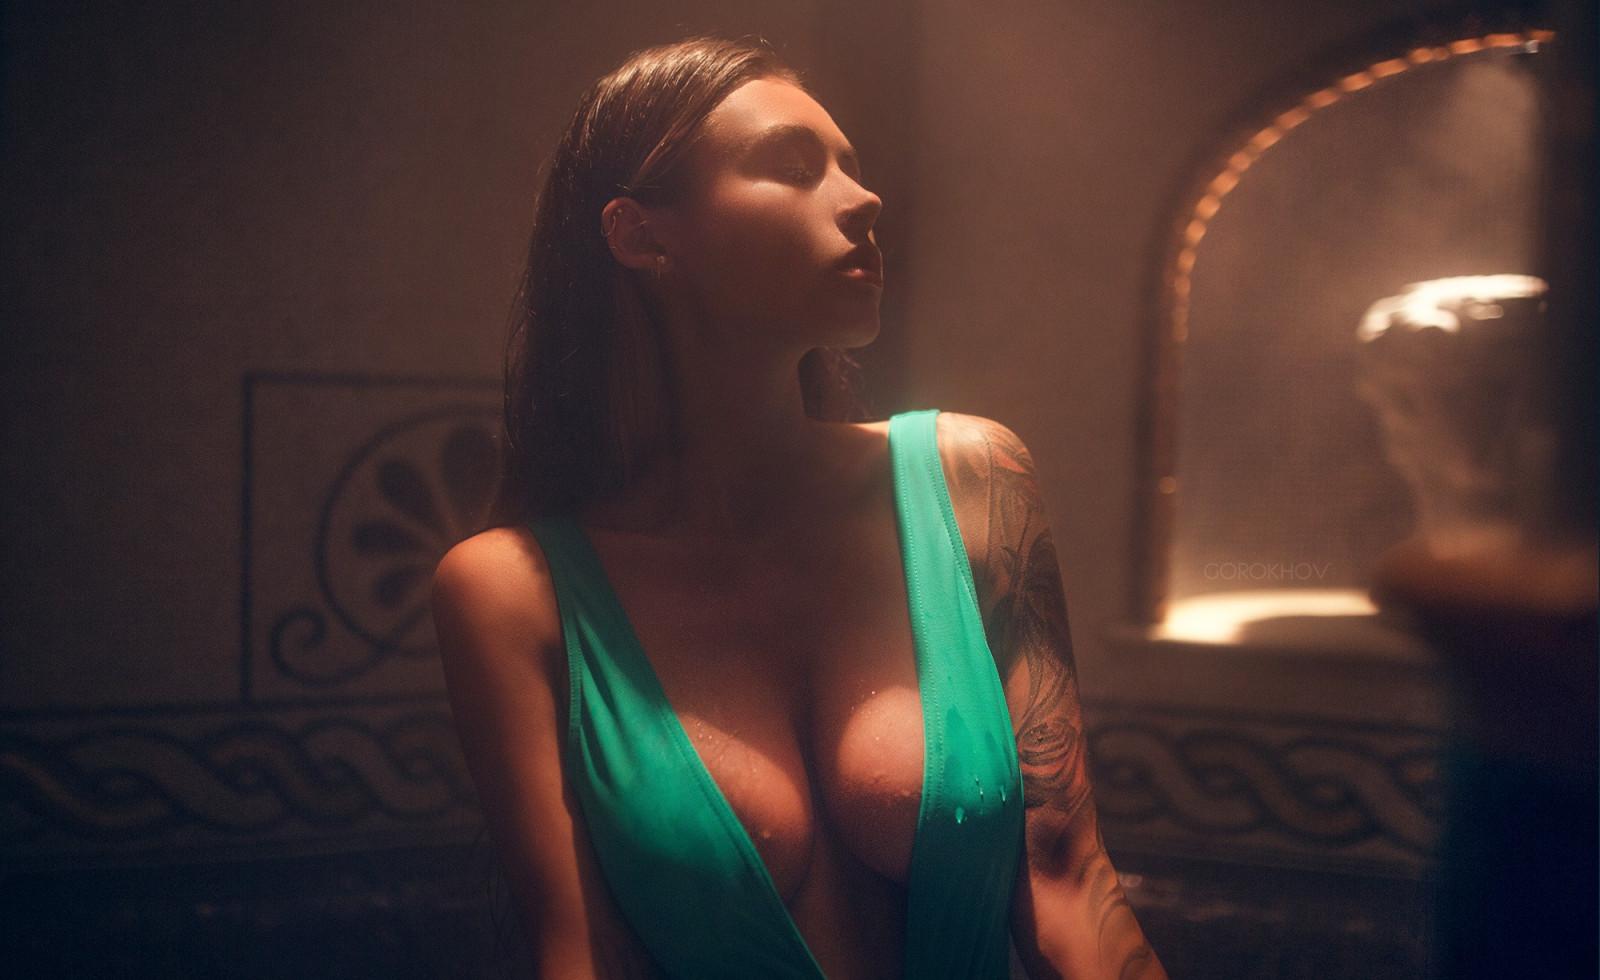 https://c.wallhere.com/photos/69/eb/Diana_Melison_big_boobs_brunette_closed_eyes_cleavage_tattoo_piercing_no_bra-322929.jpg!d